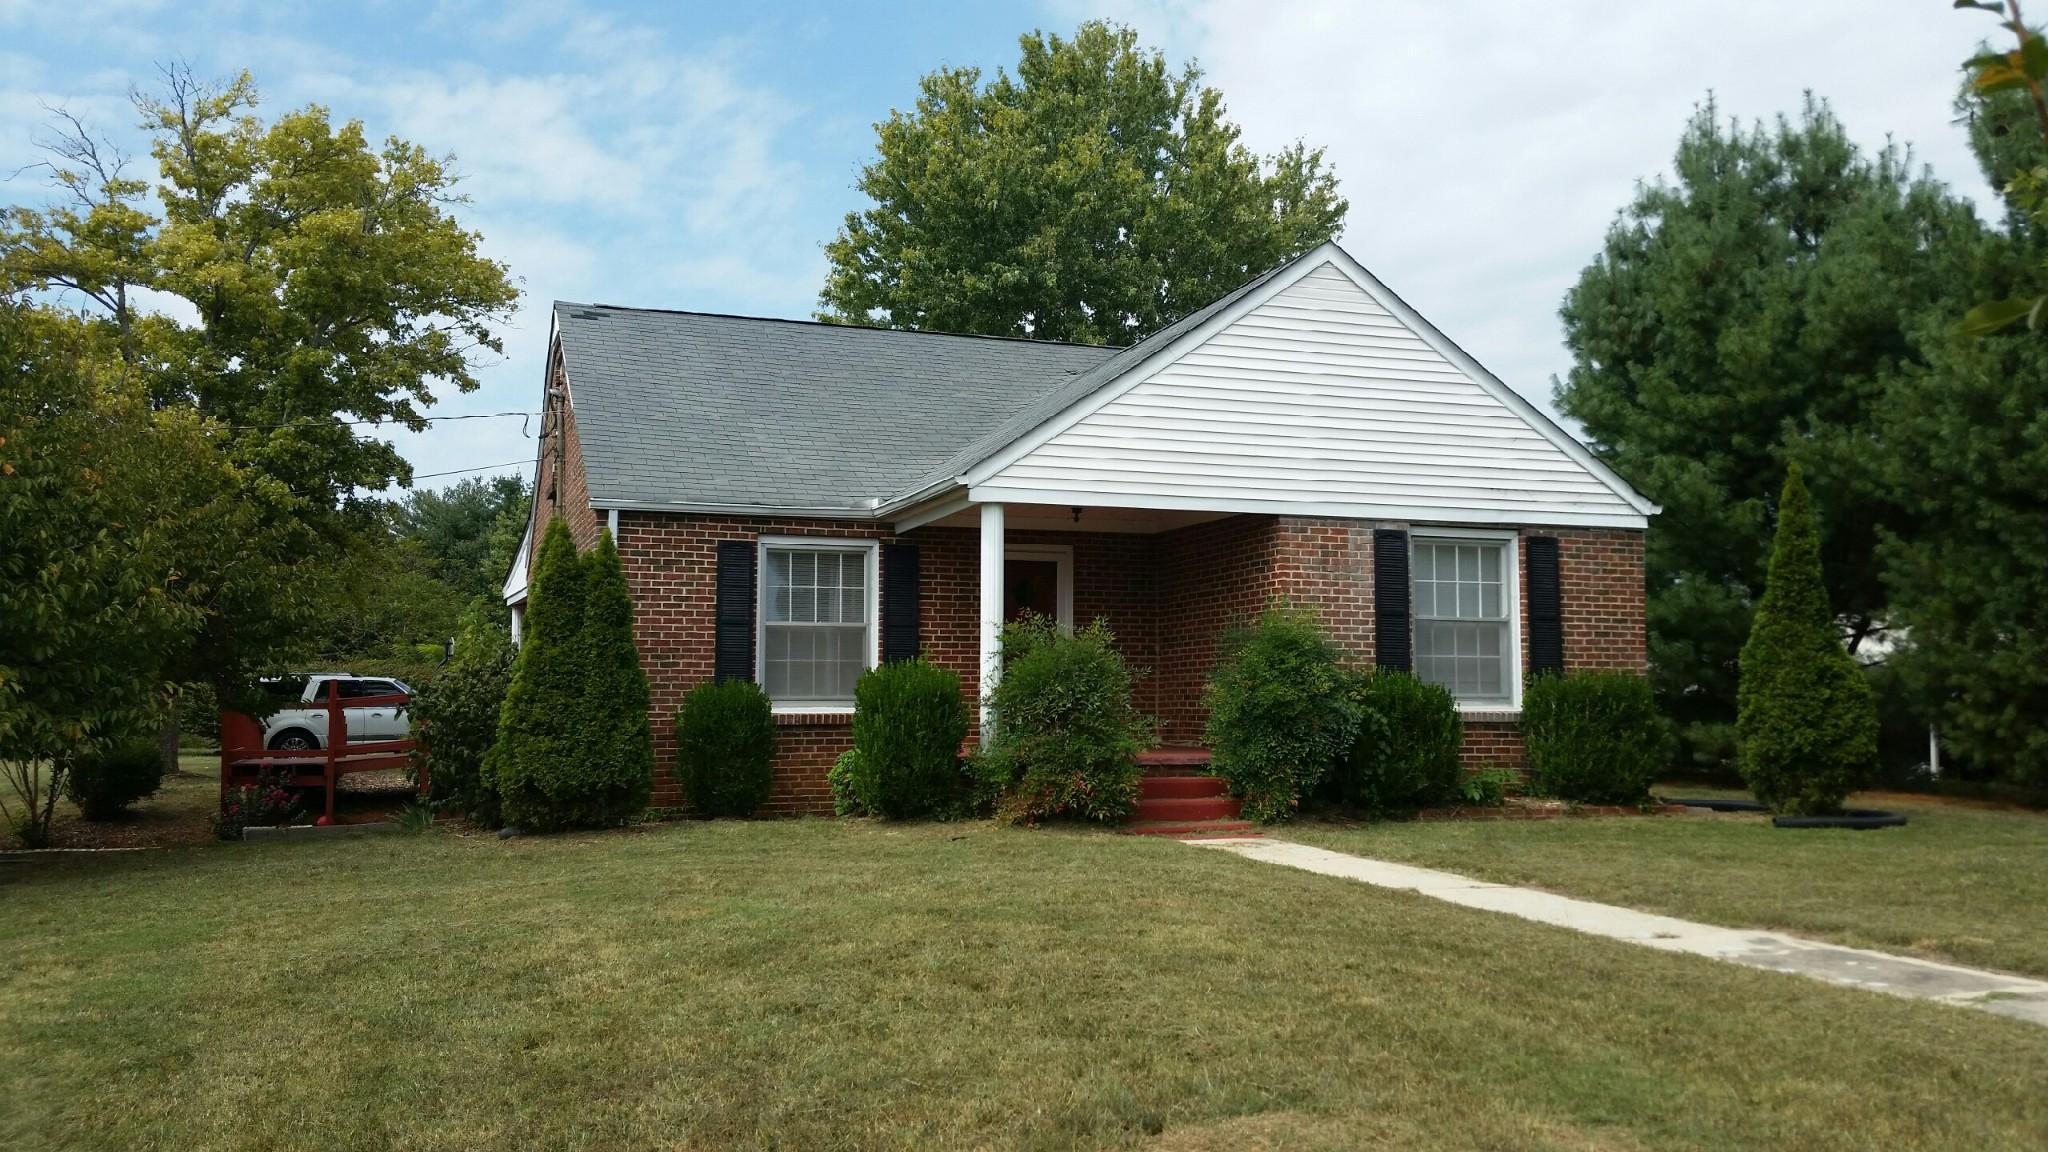 909 Red Rd, Mc Minnville, TN 37110 - Mc Minnville, TN real estate listing